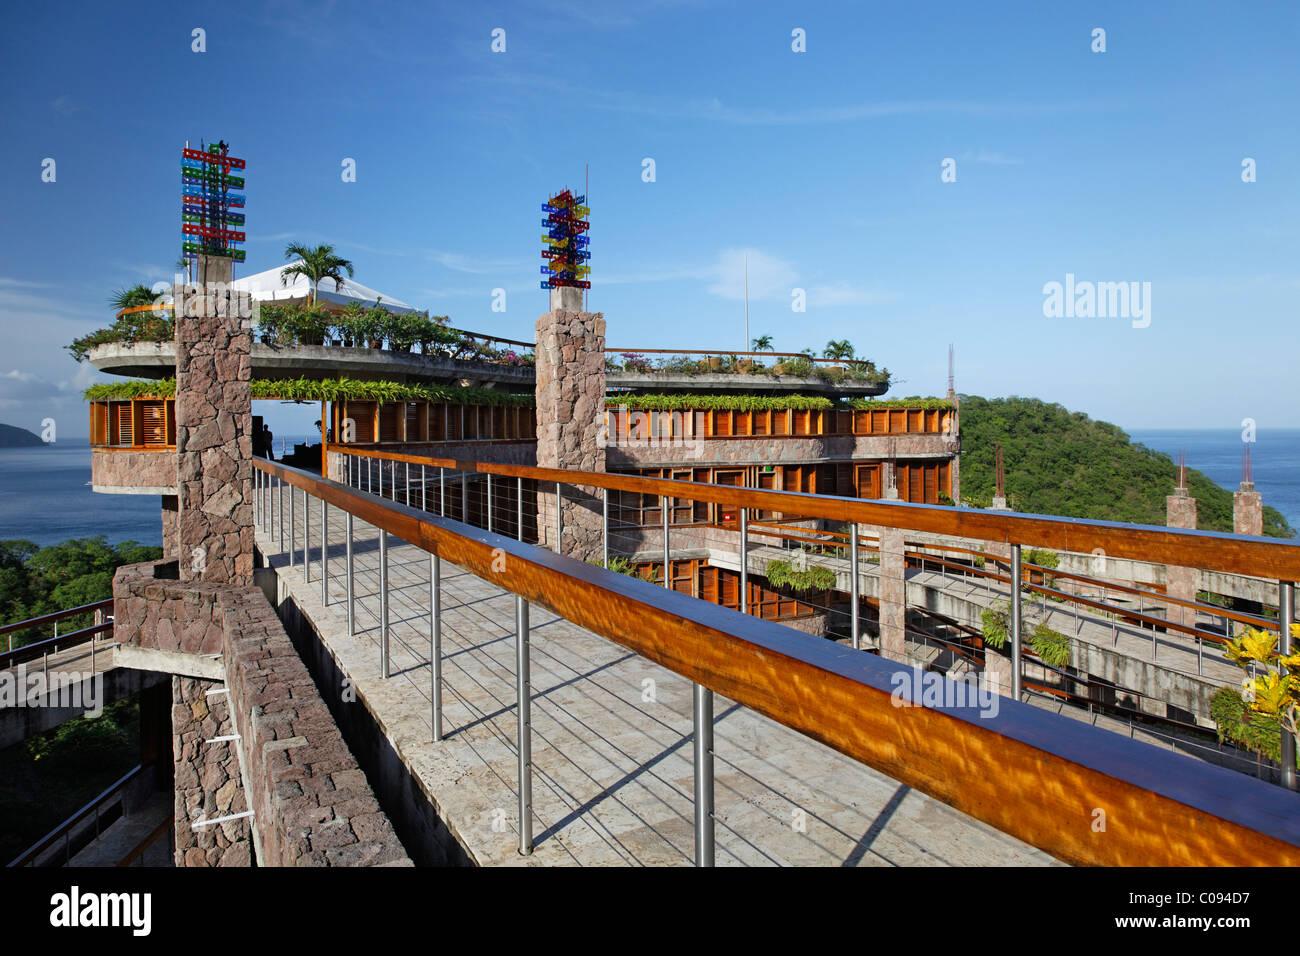 Bridge to restaurant, Jade Mountain luxury hotel, Saint Lucia, Windward Islands, Lesser Antilles, Caribbean, Caribbean Sea Stock Photo